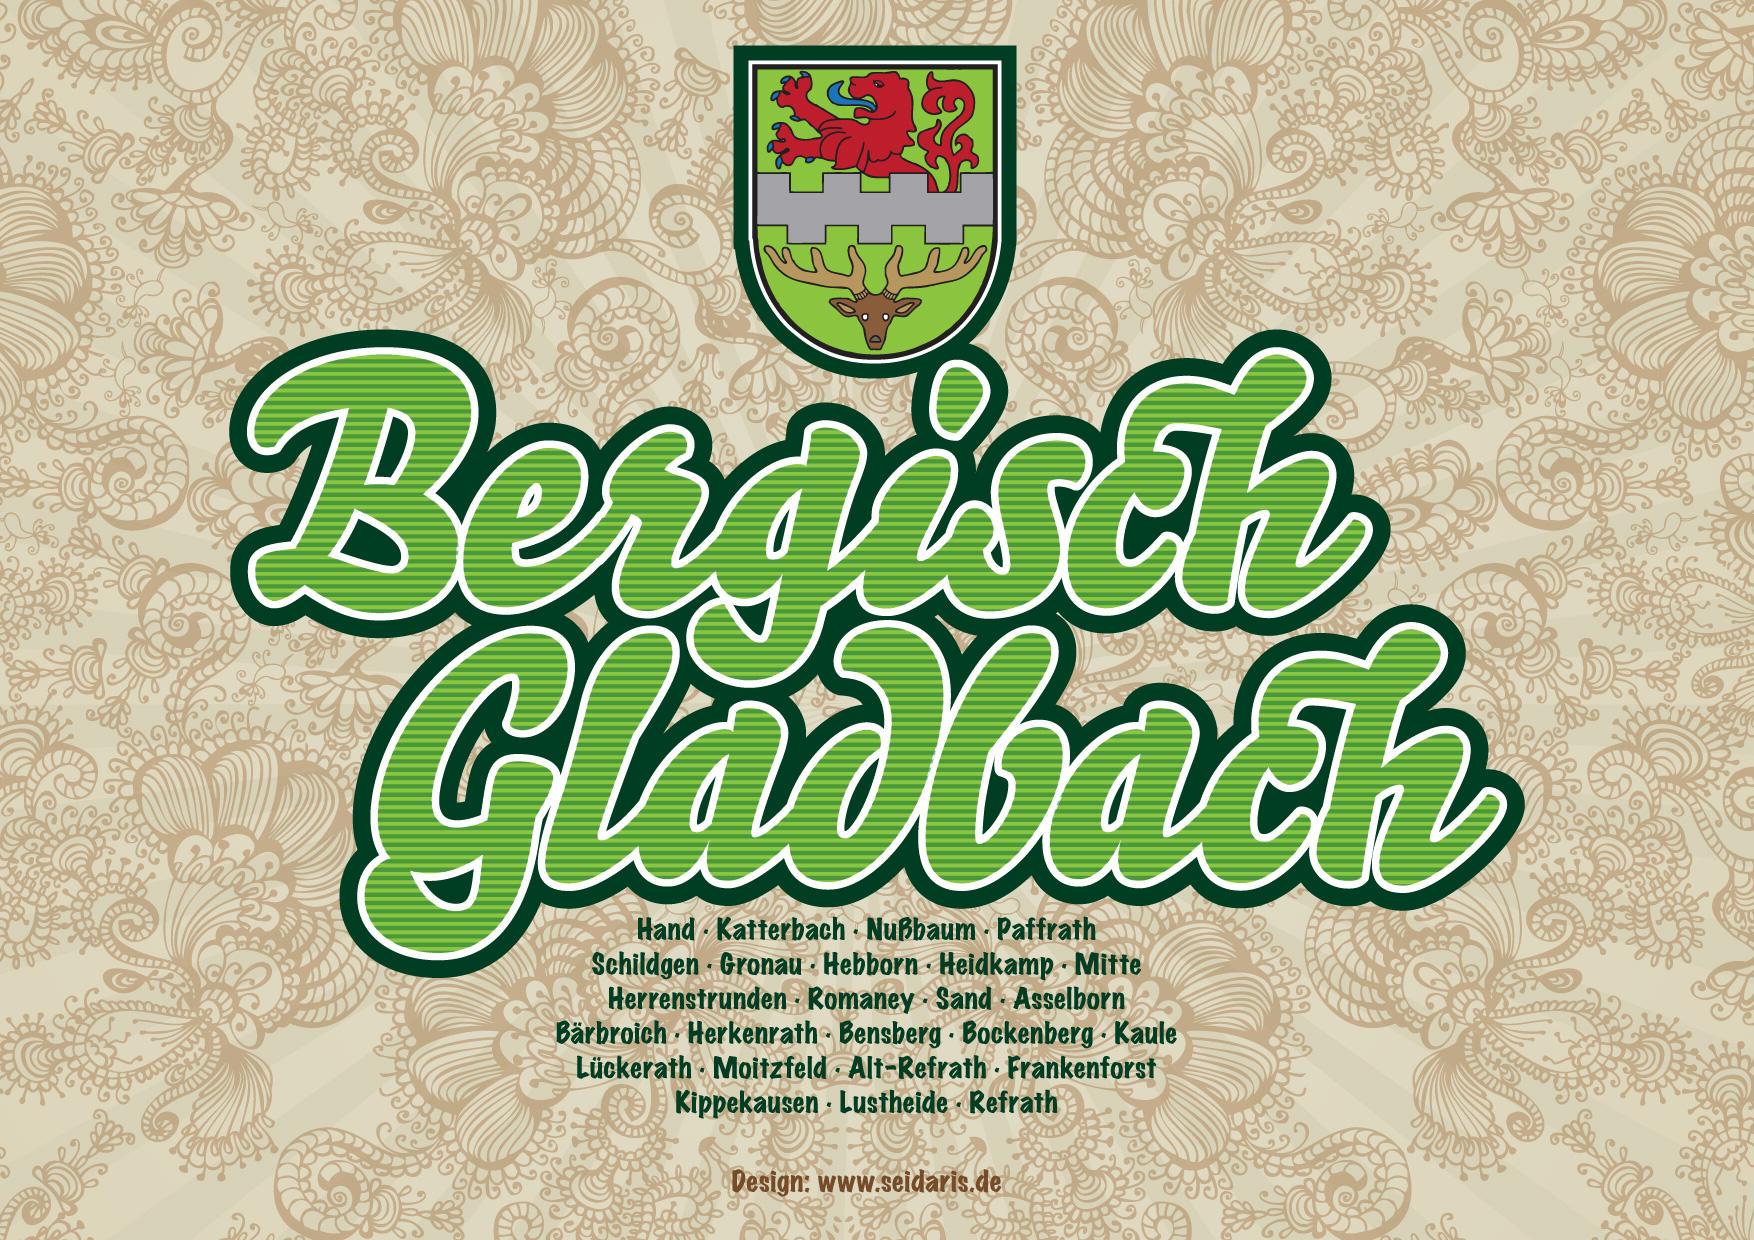 SEIDARIS_Wallpaper_Bergisch_Gladbach_Floral-Retro-01